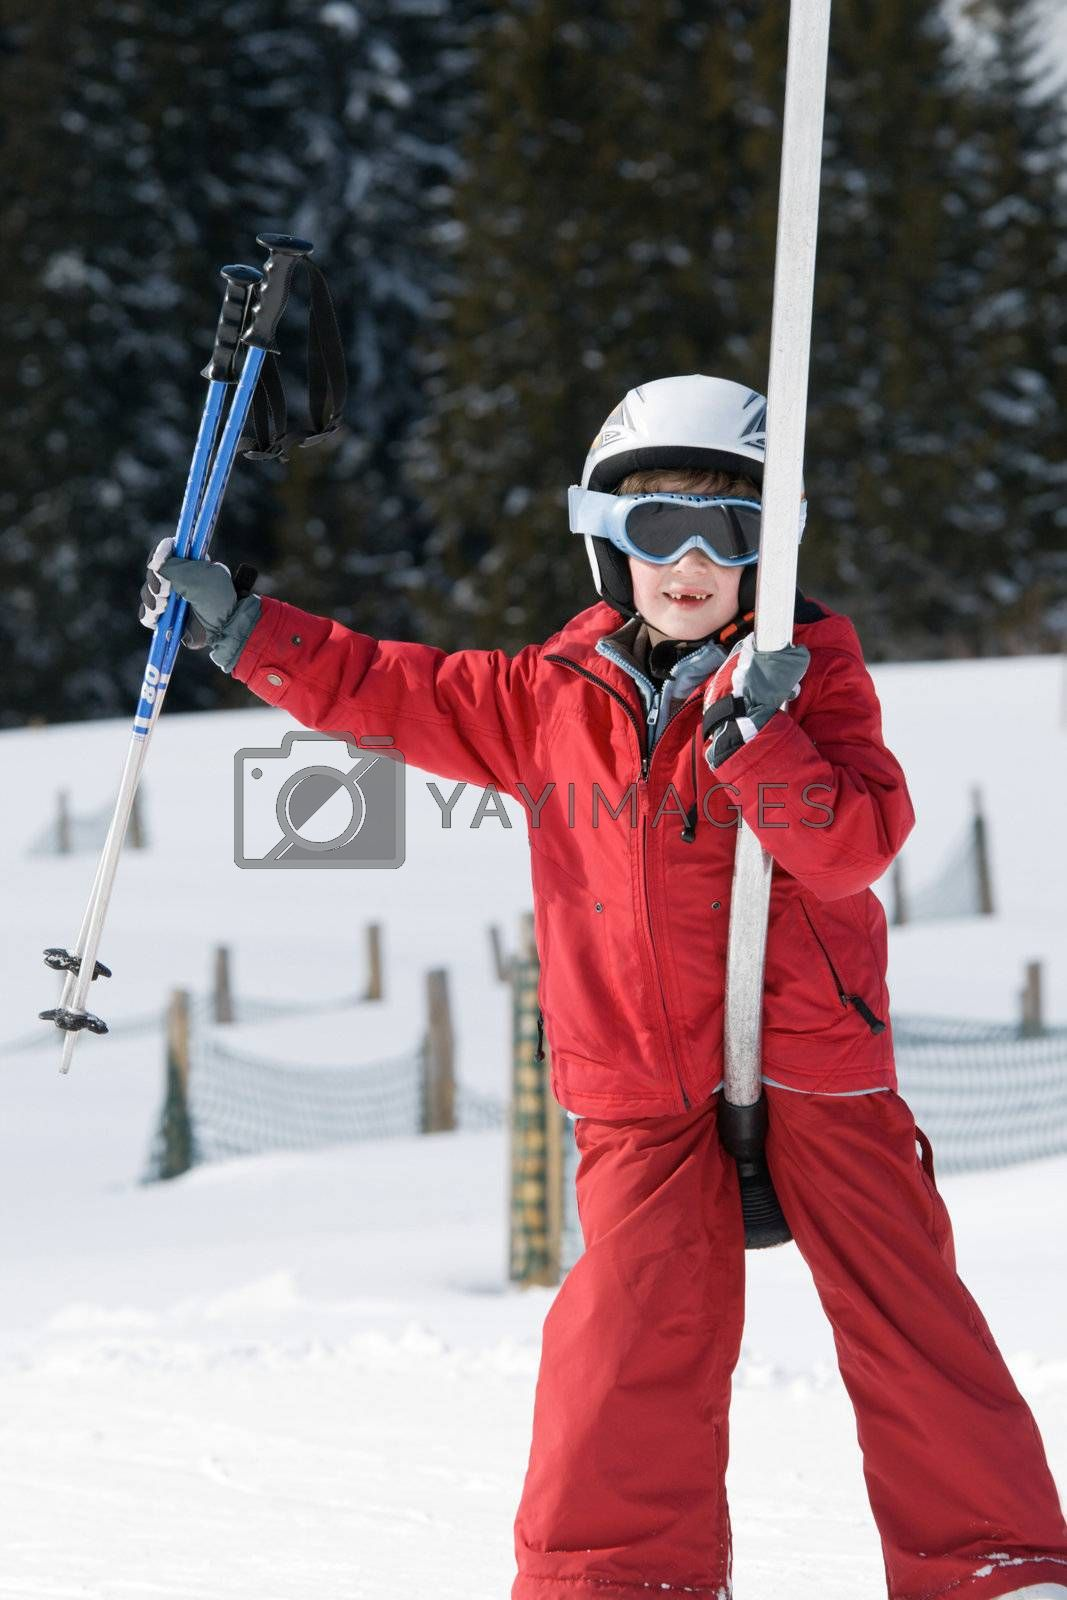 Smiling boy on a ski lift carrying ski poles